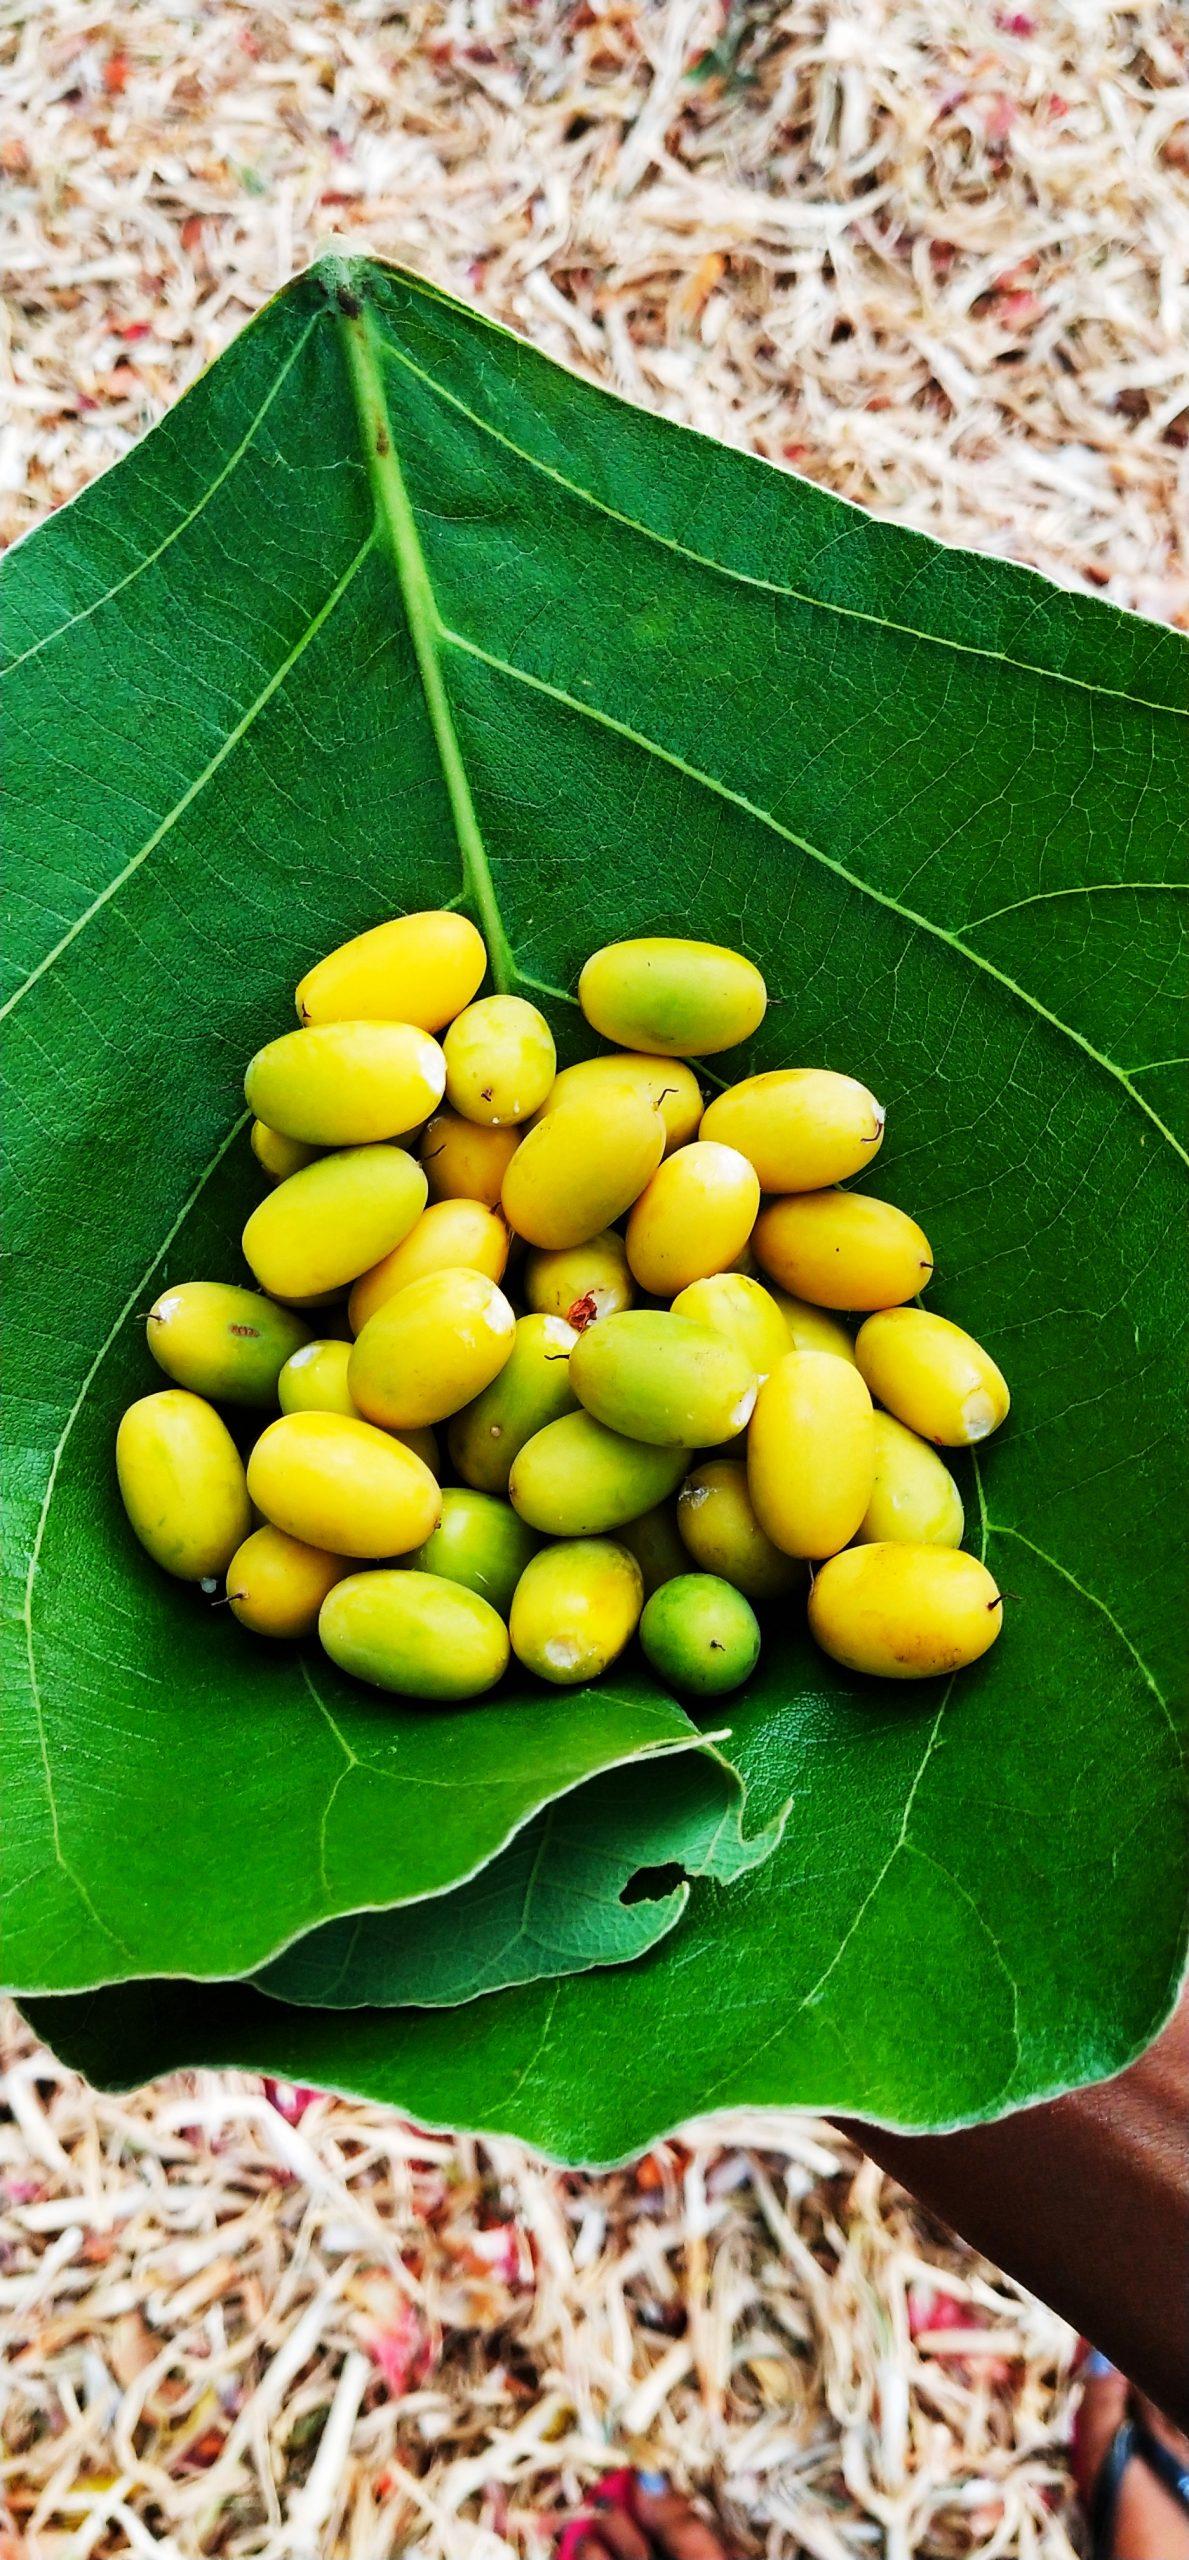 Manilkara hexandra's berries